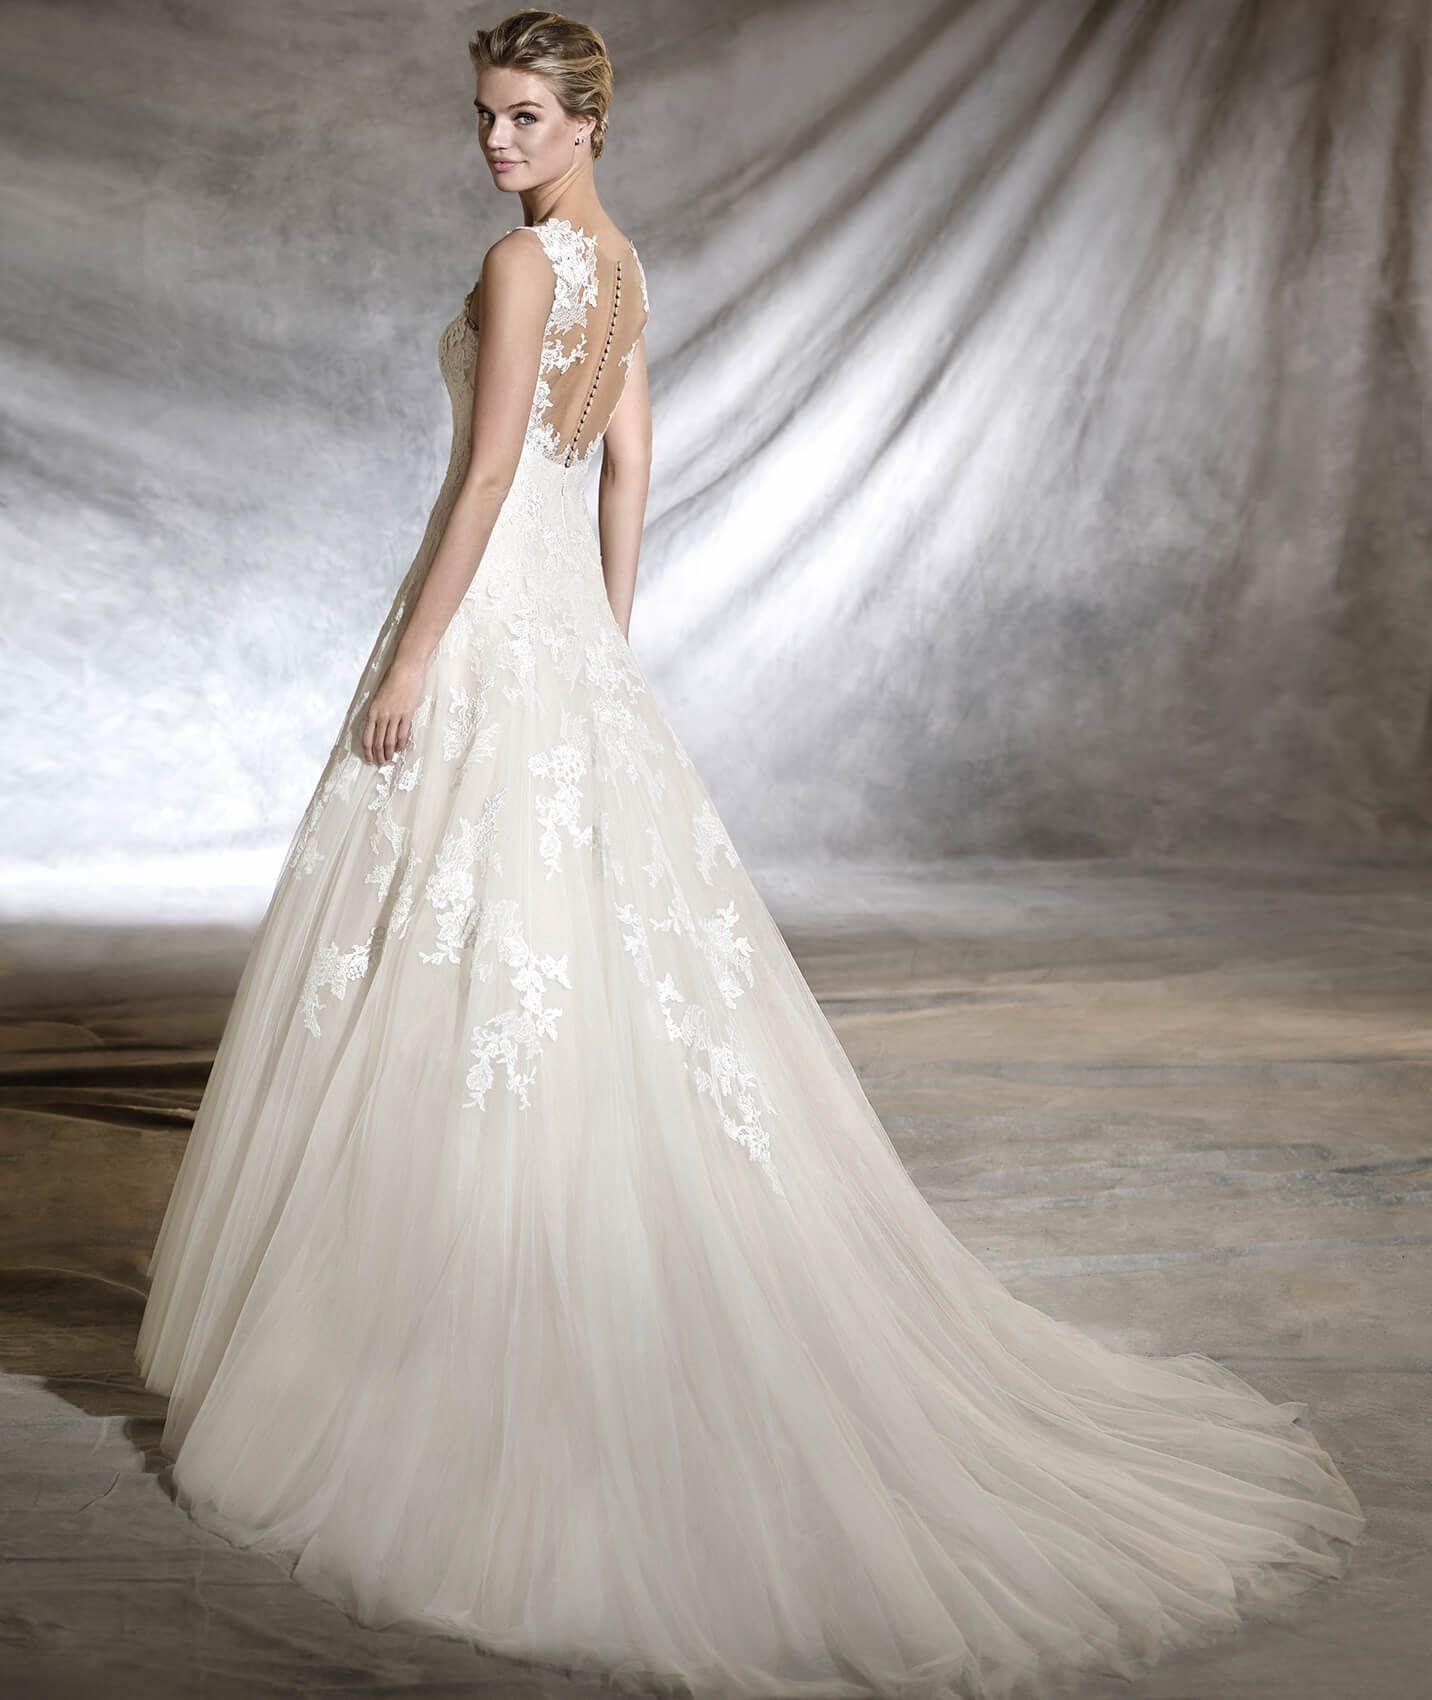 OLWEN - Princess wedding dress | Pinterest | Princess wedding ...